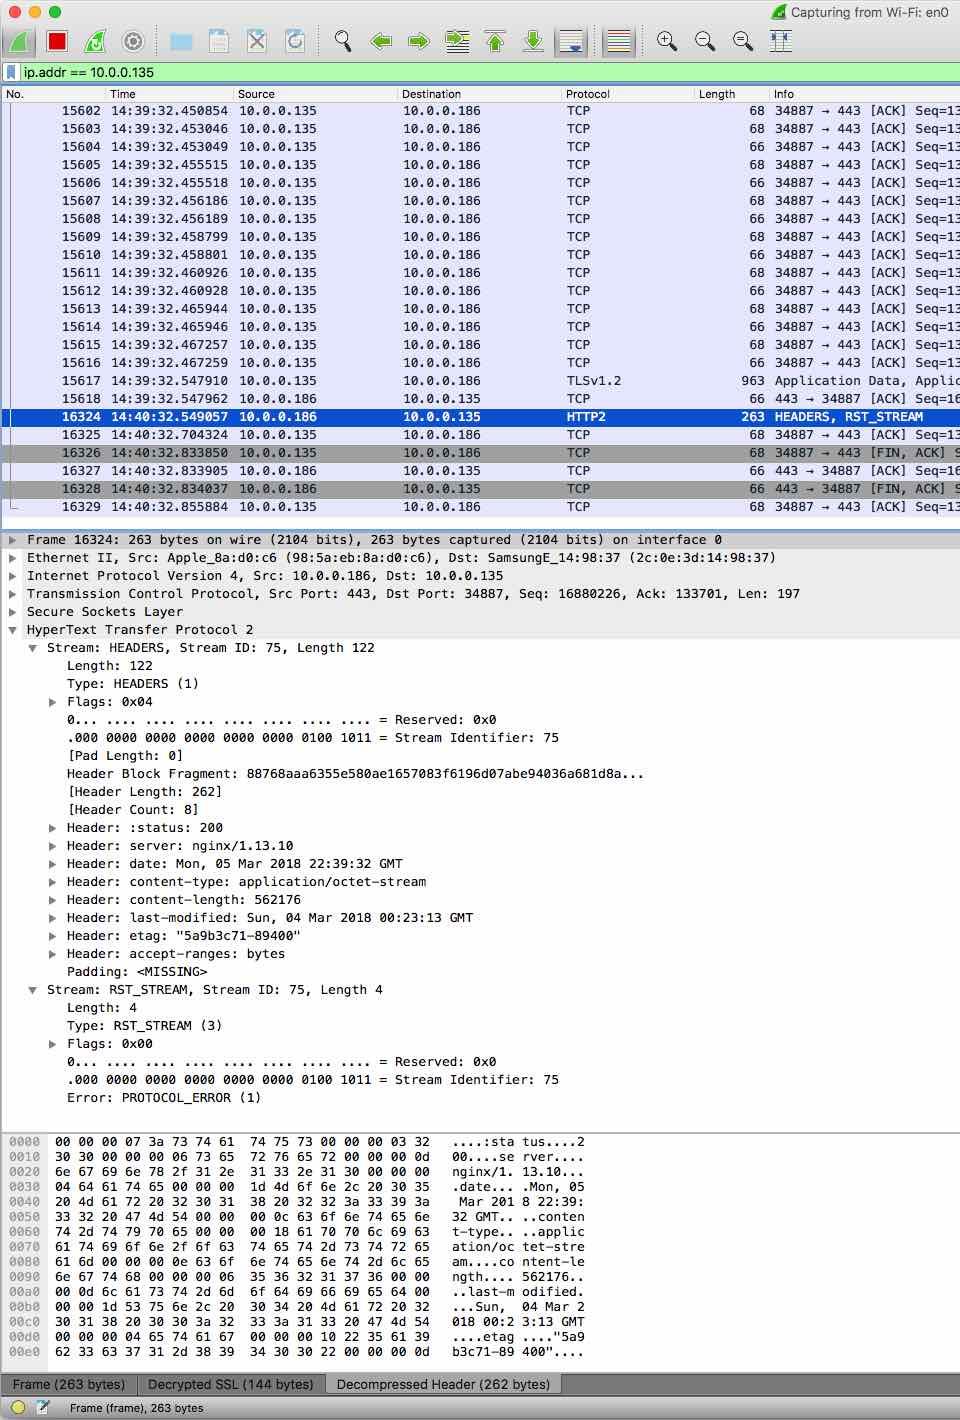 https://github.com/jifang/nginx_bug_repo1/blob/master/files/wireshark.jpg